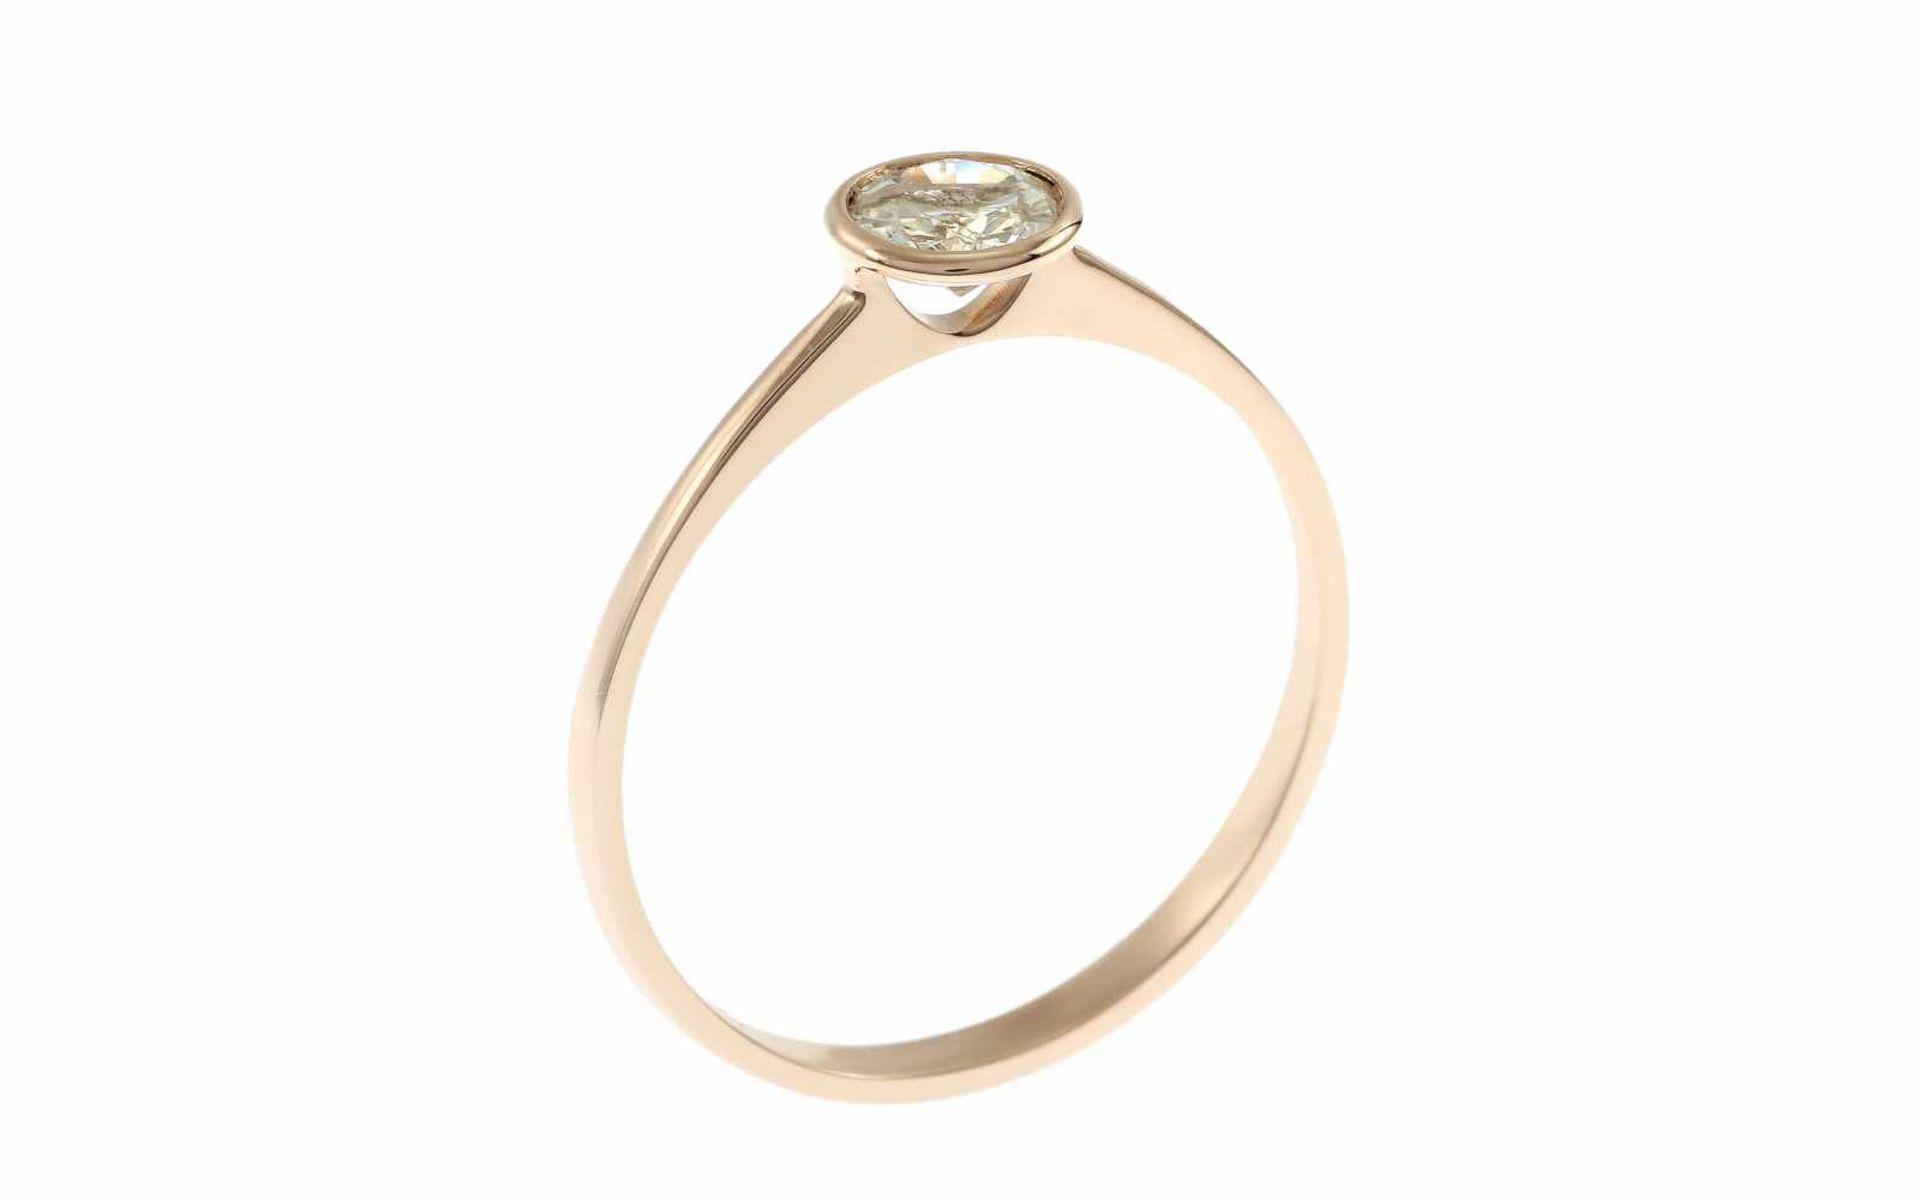 Solitärring Ring 18K RG mit 0,36 ct Diamant G/pi, RW: 55 Total 1,30 gr